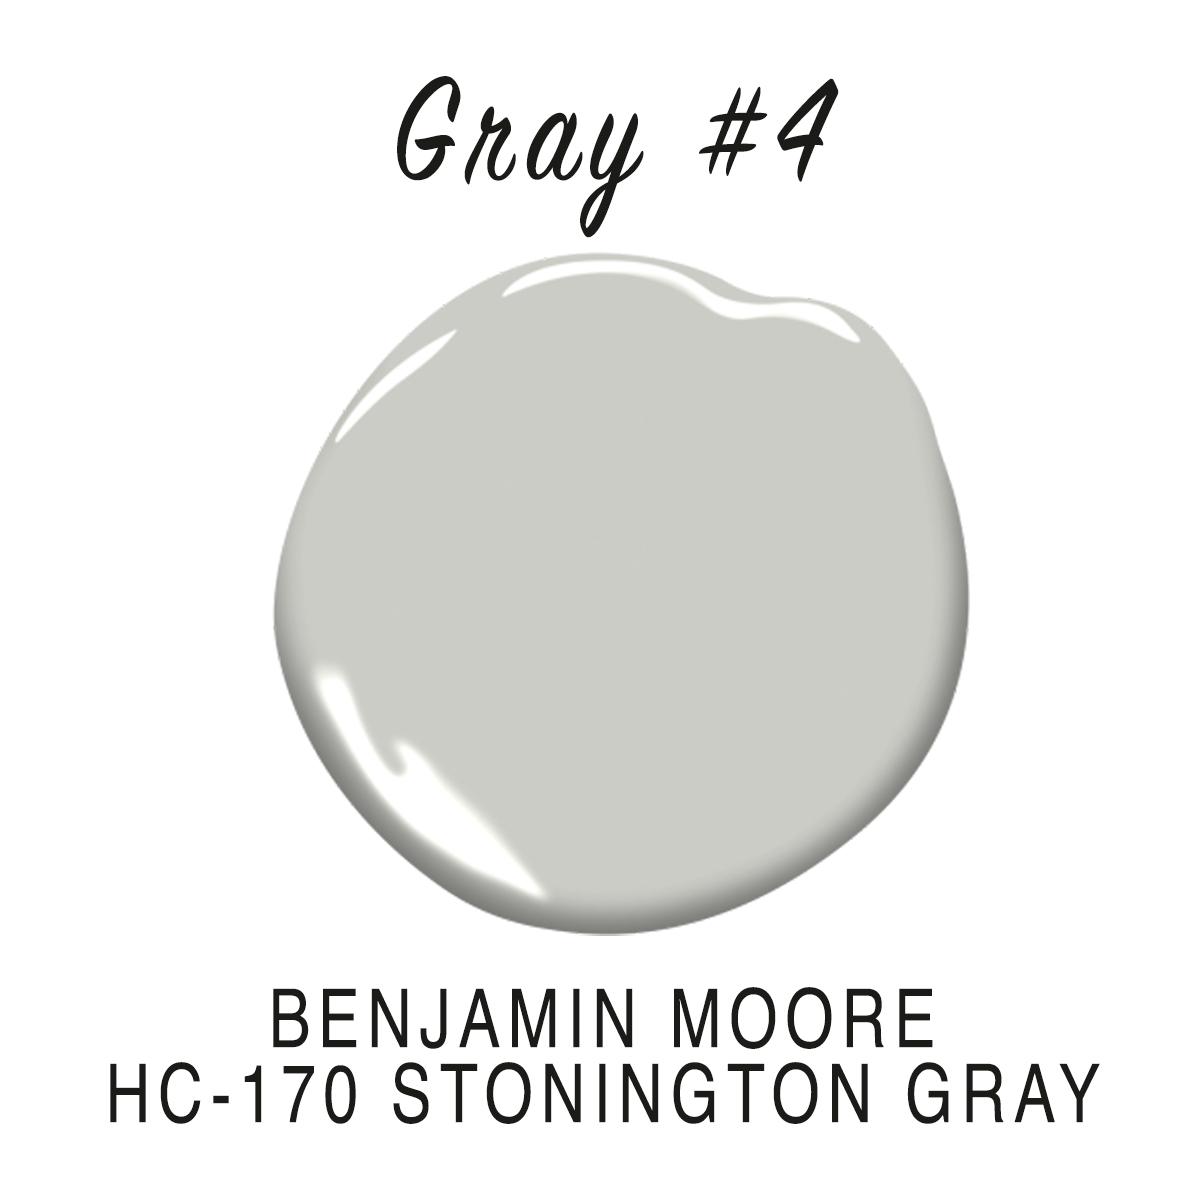 gray 4 top gray paint colors stonington gray.jpg